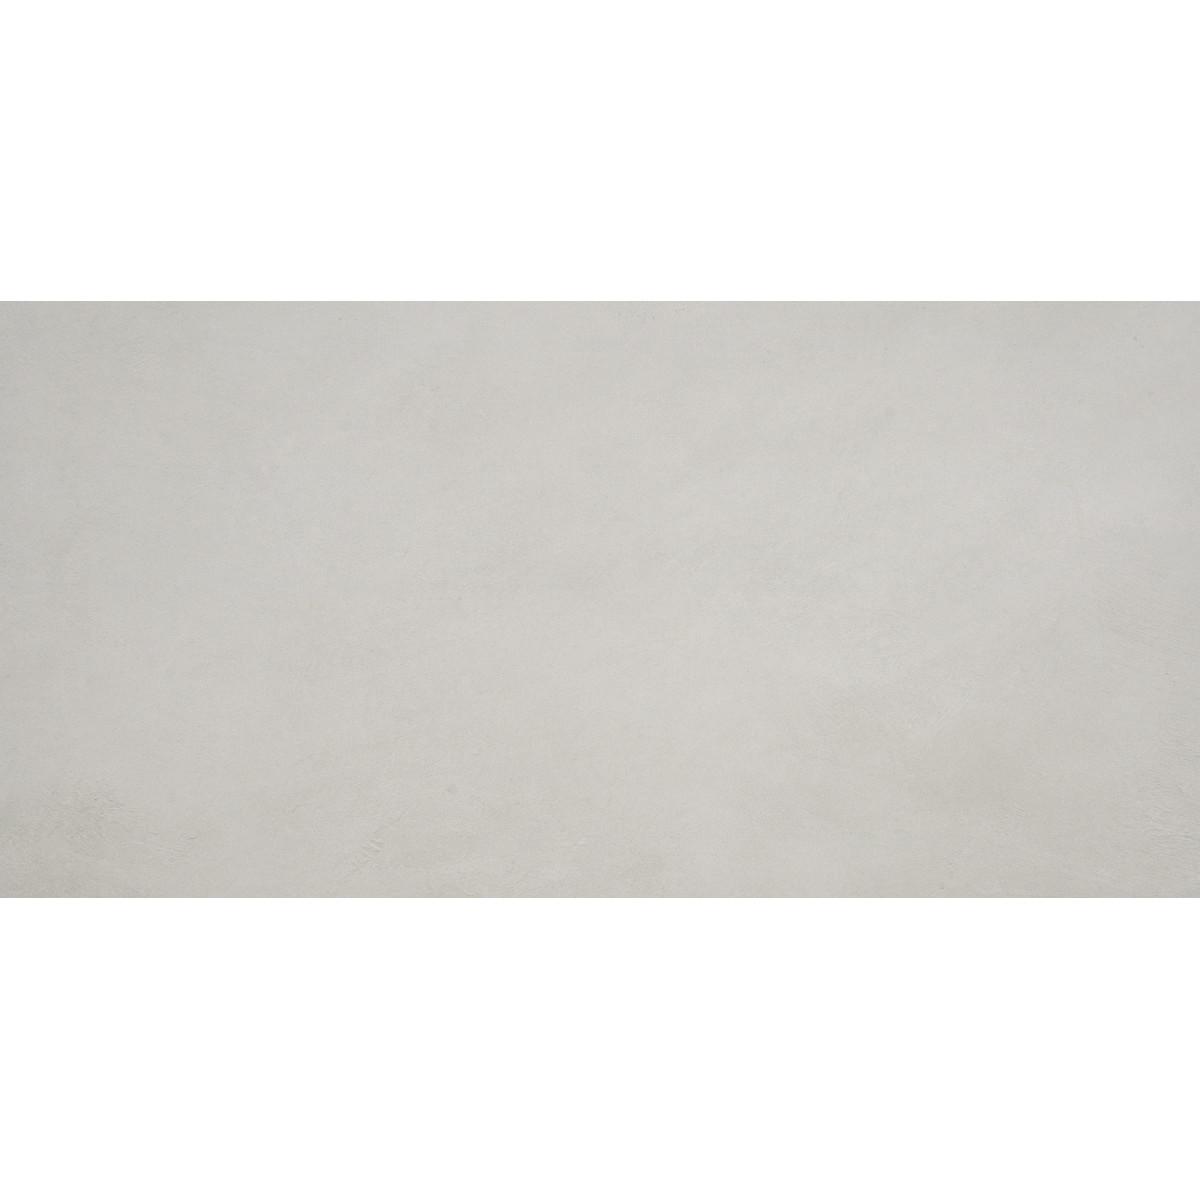 Керамогранит «Iceberg Light» 30x60 144 М² Цвет Серый